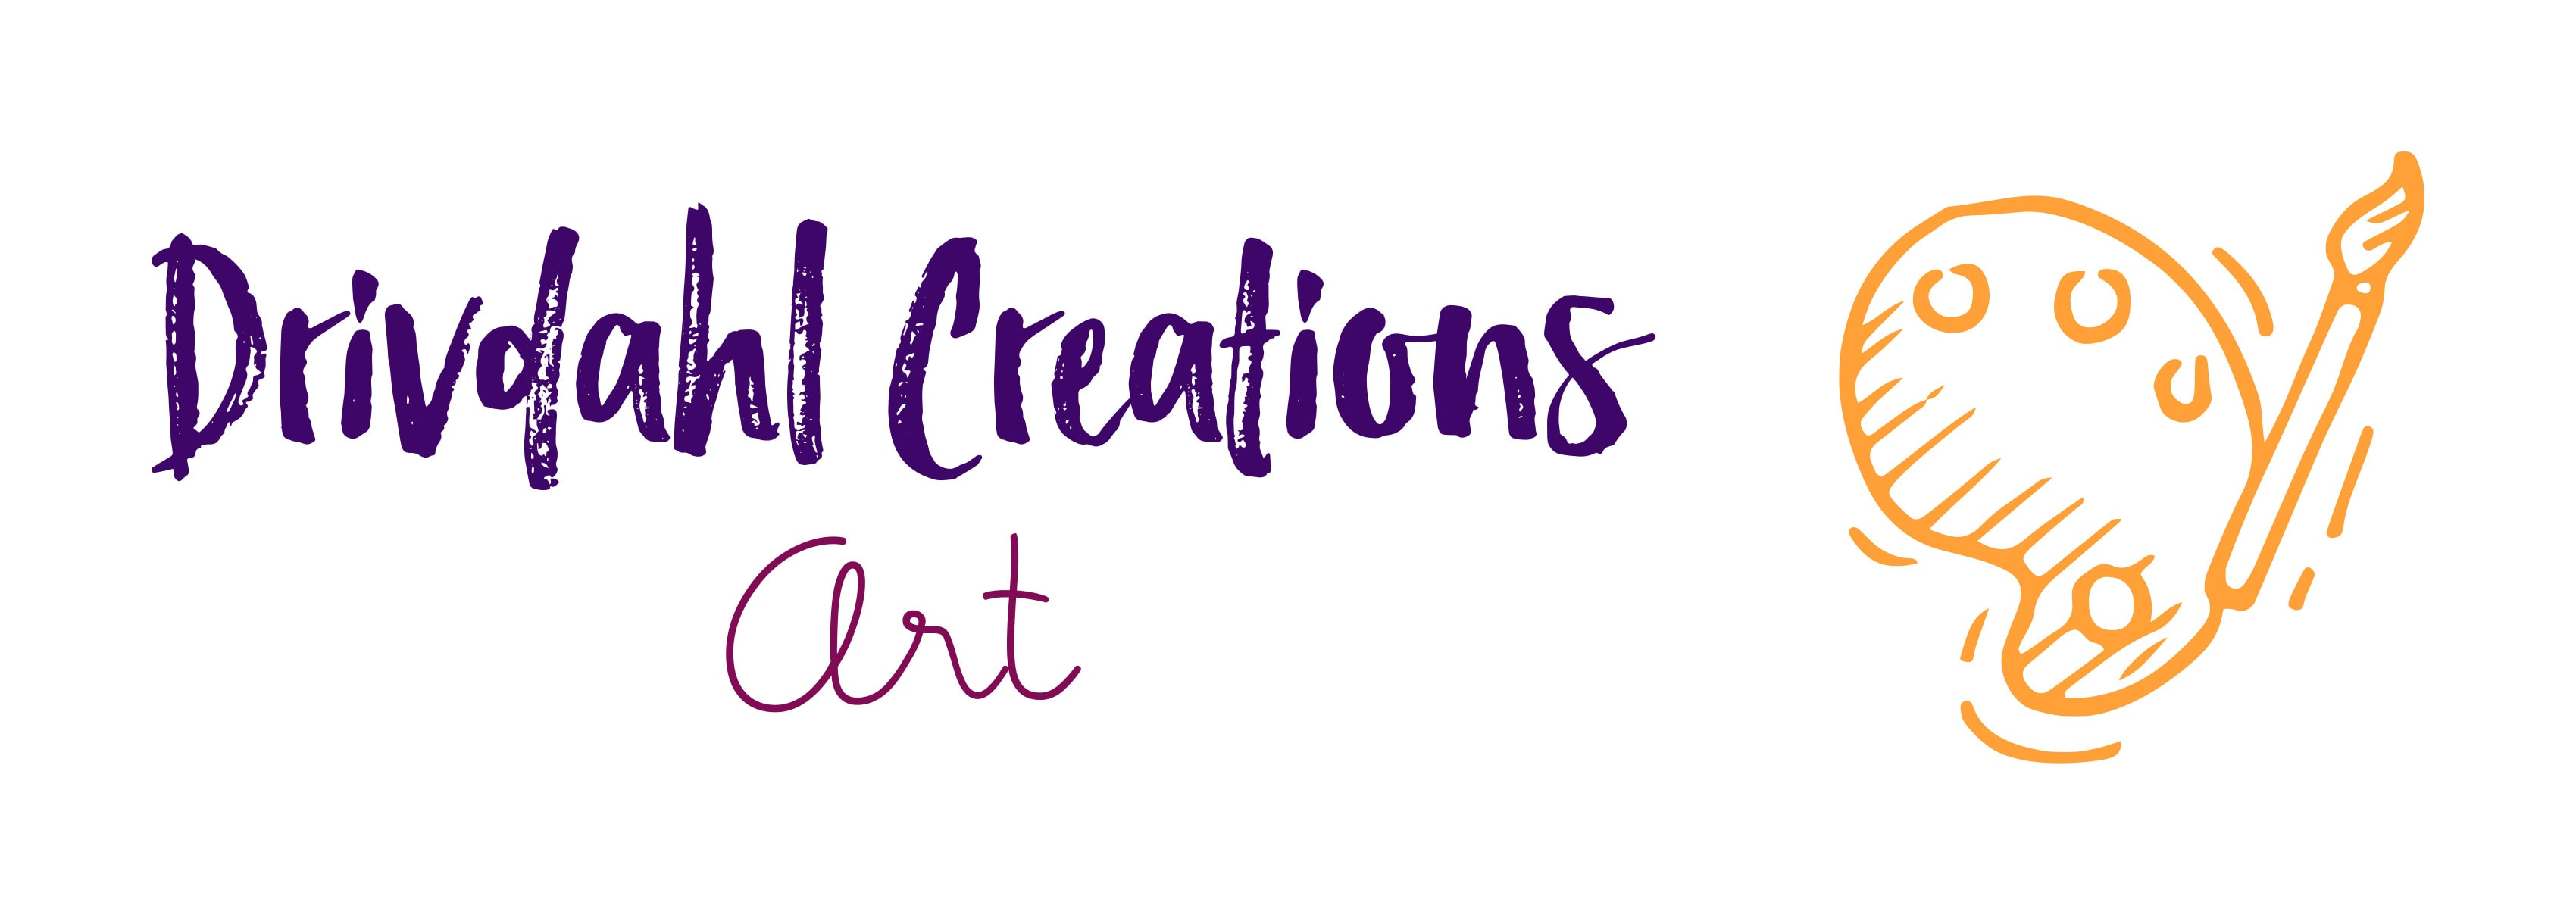 Drivdahl Creations